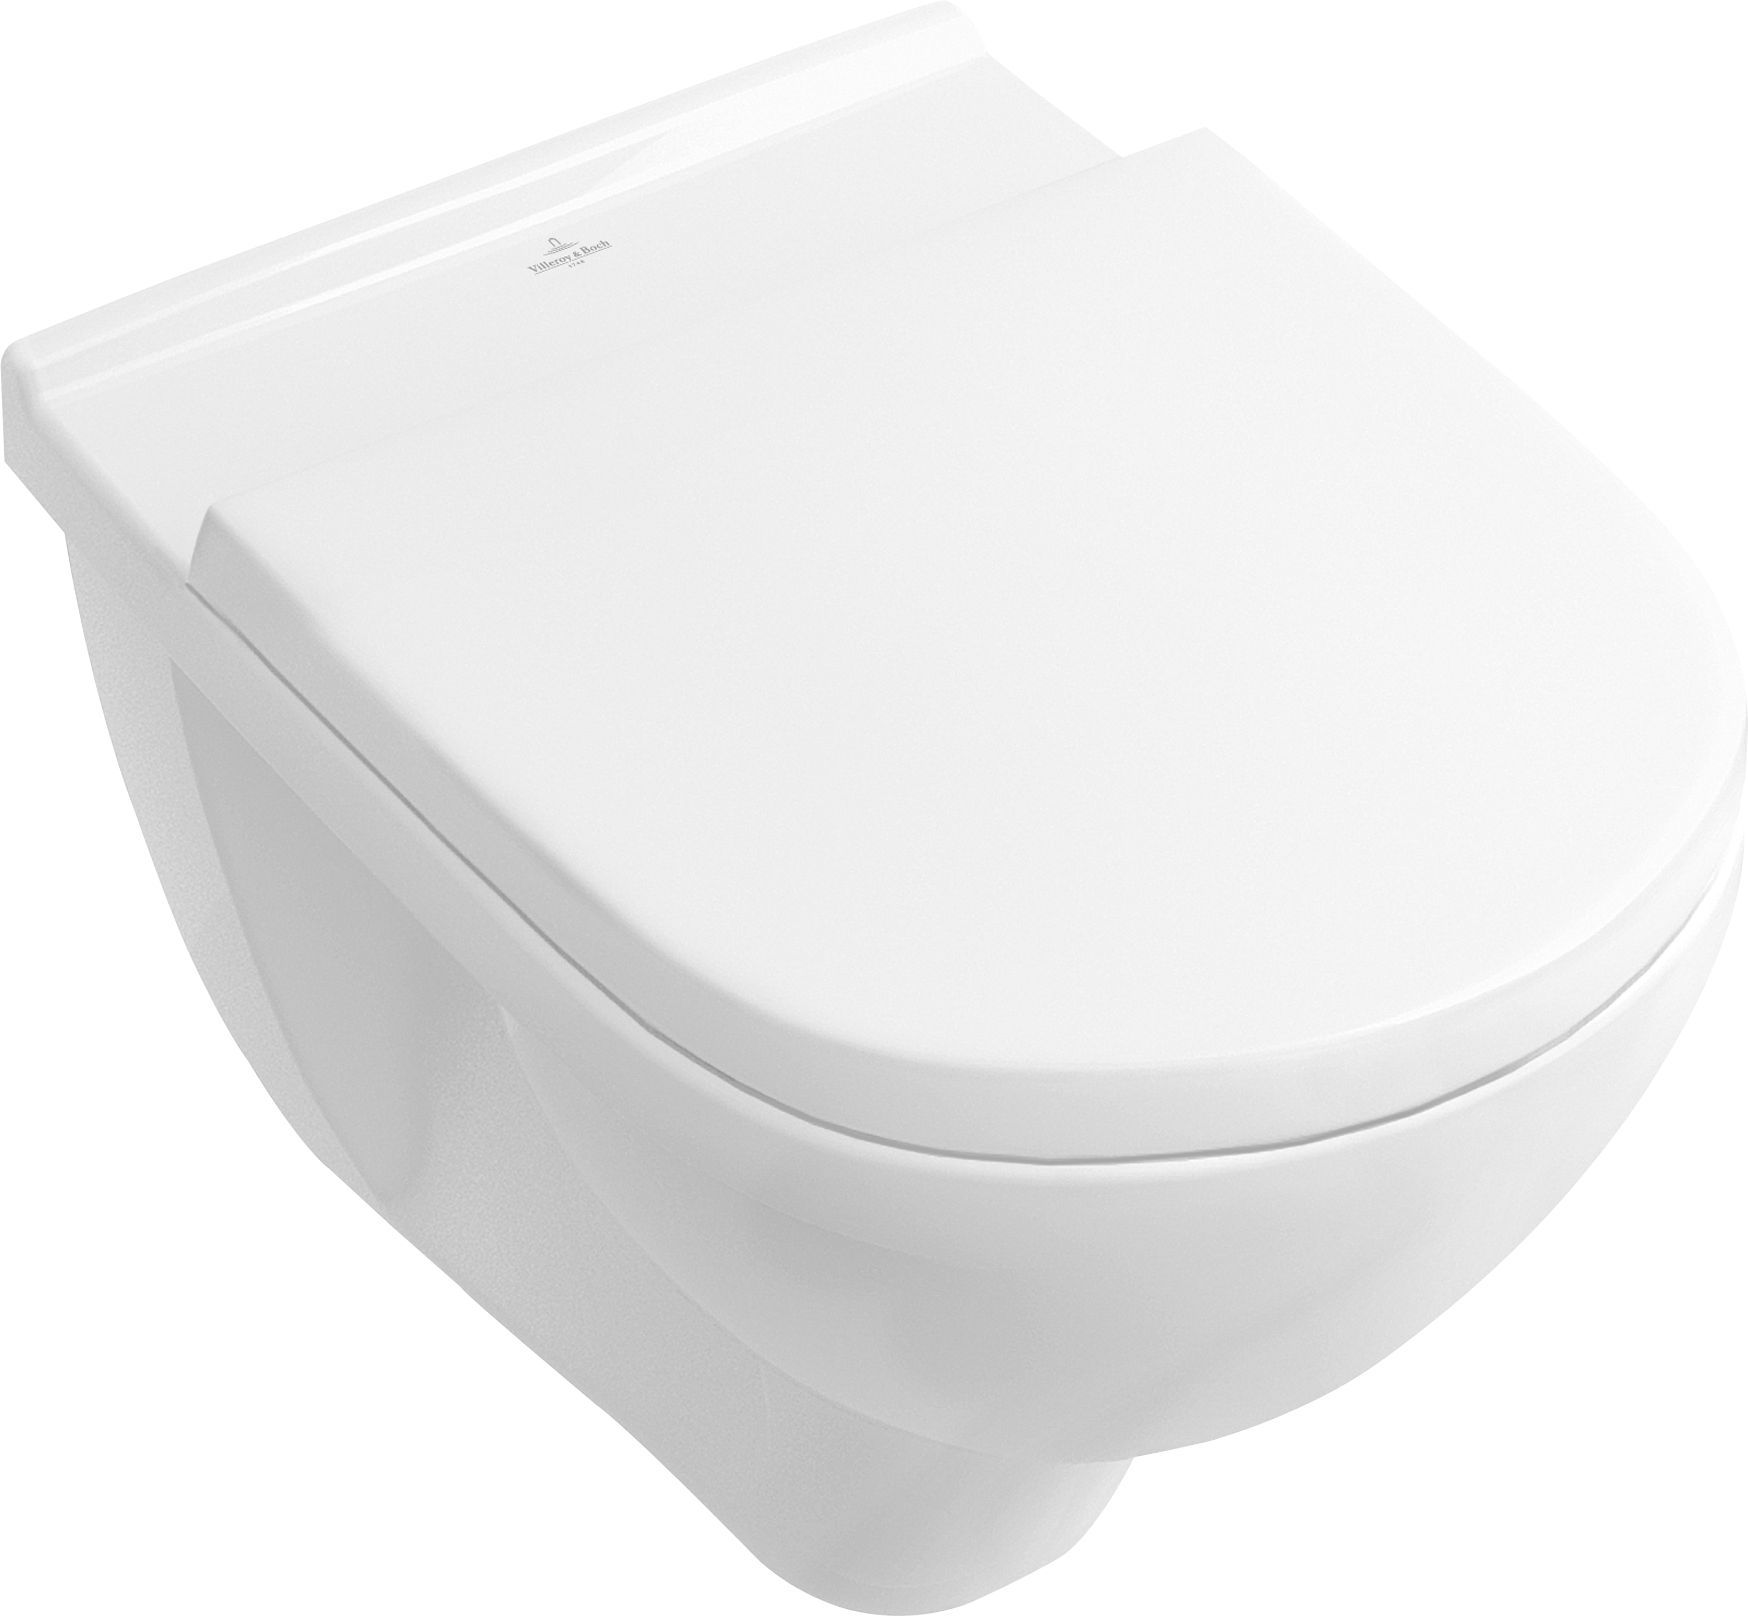 Villeroy & Boch O.novo Combi-Pack Tiefspül-Wand-WC DirectFlush mit offenem Spülrand L: 56 B: 36 cm weiß mit CeramicPlus mit Absenkautomatik 5660HRR1